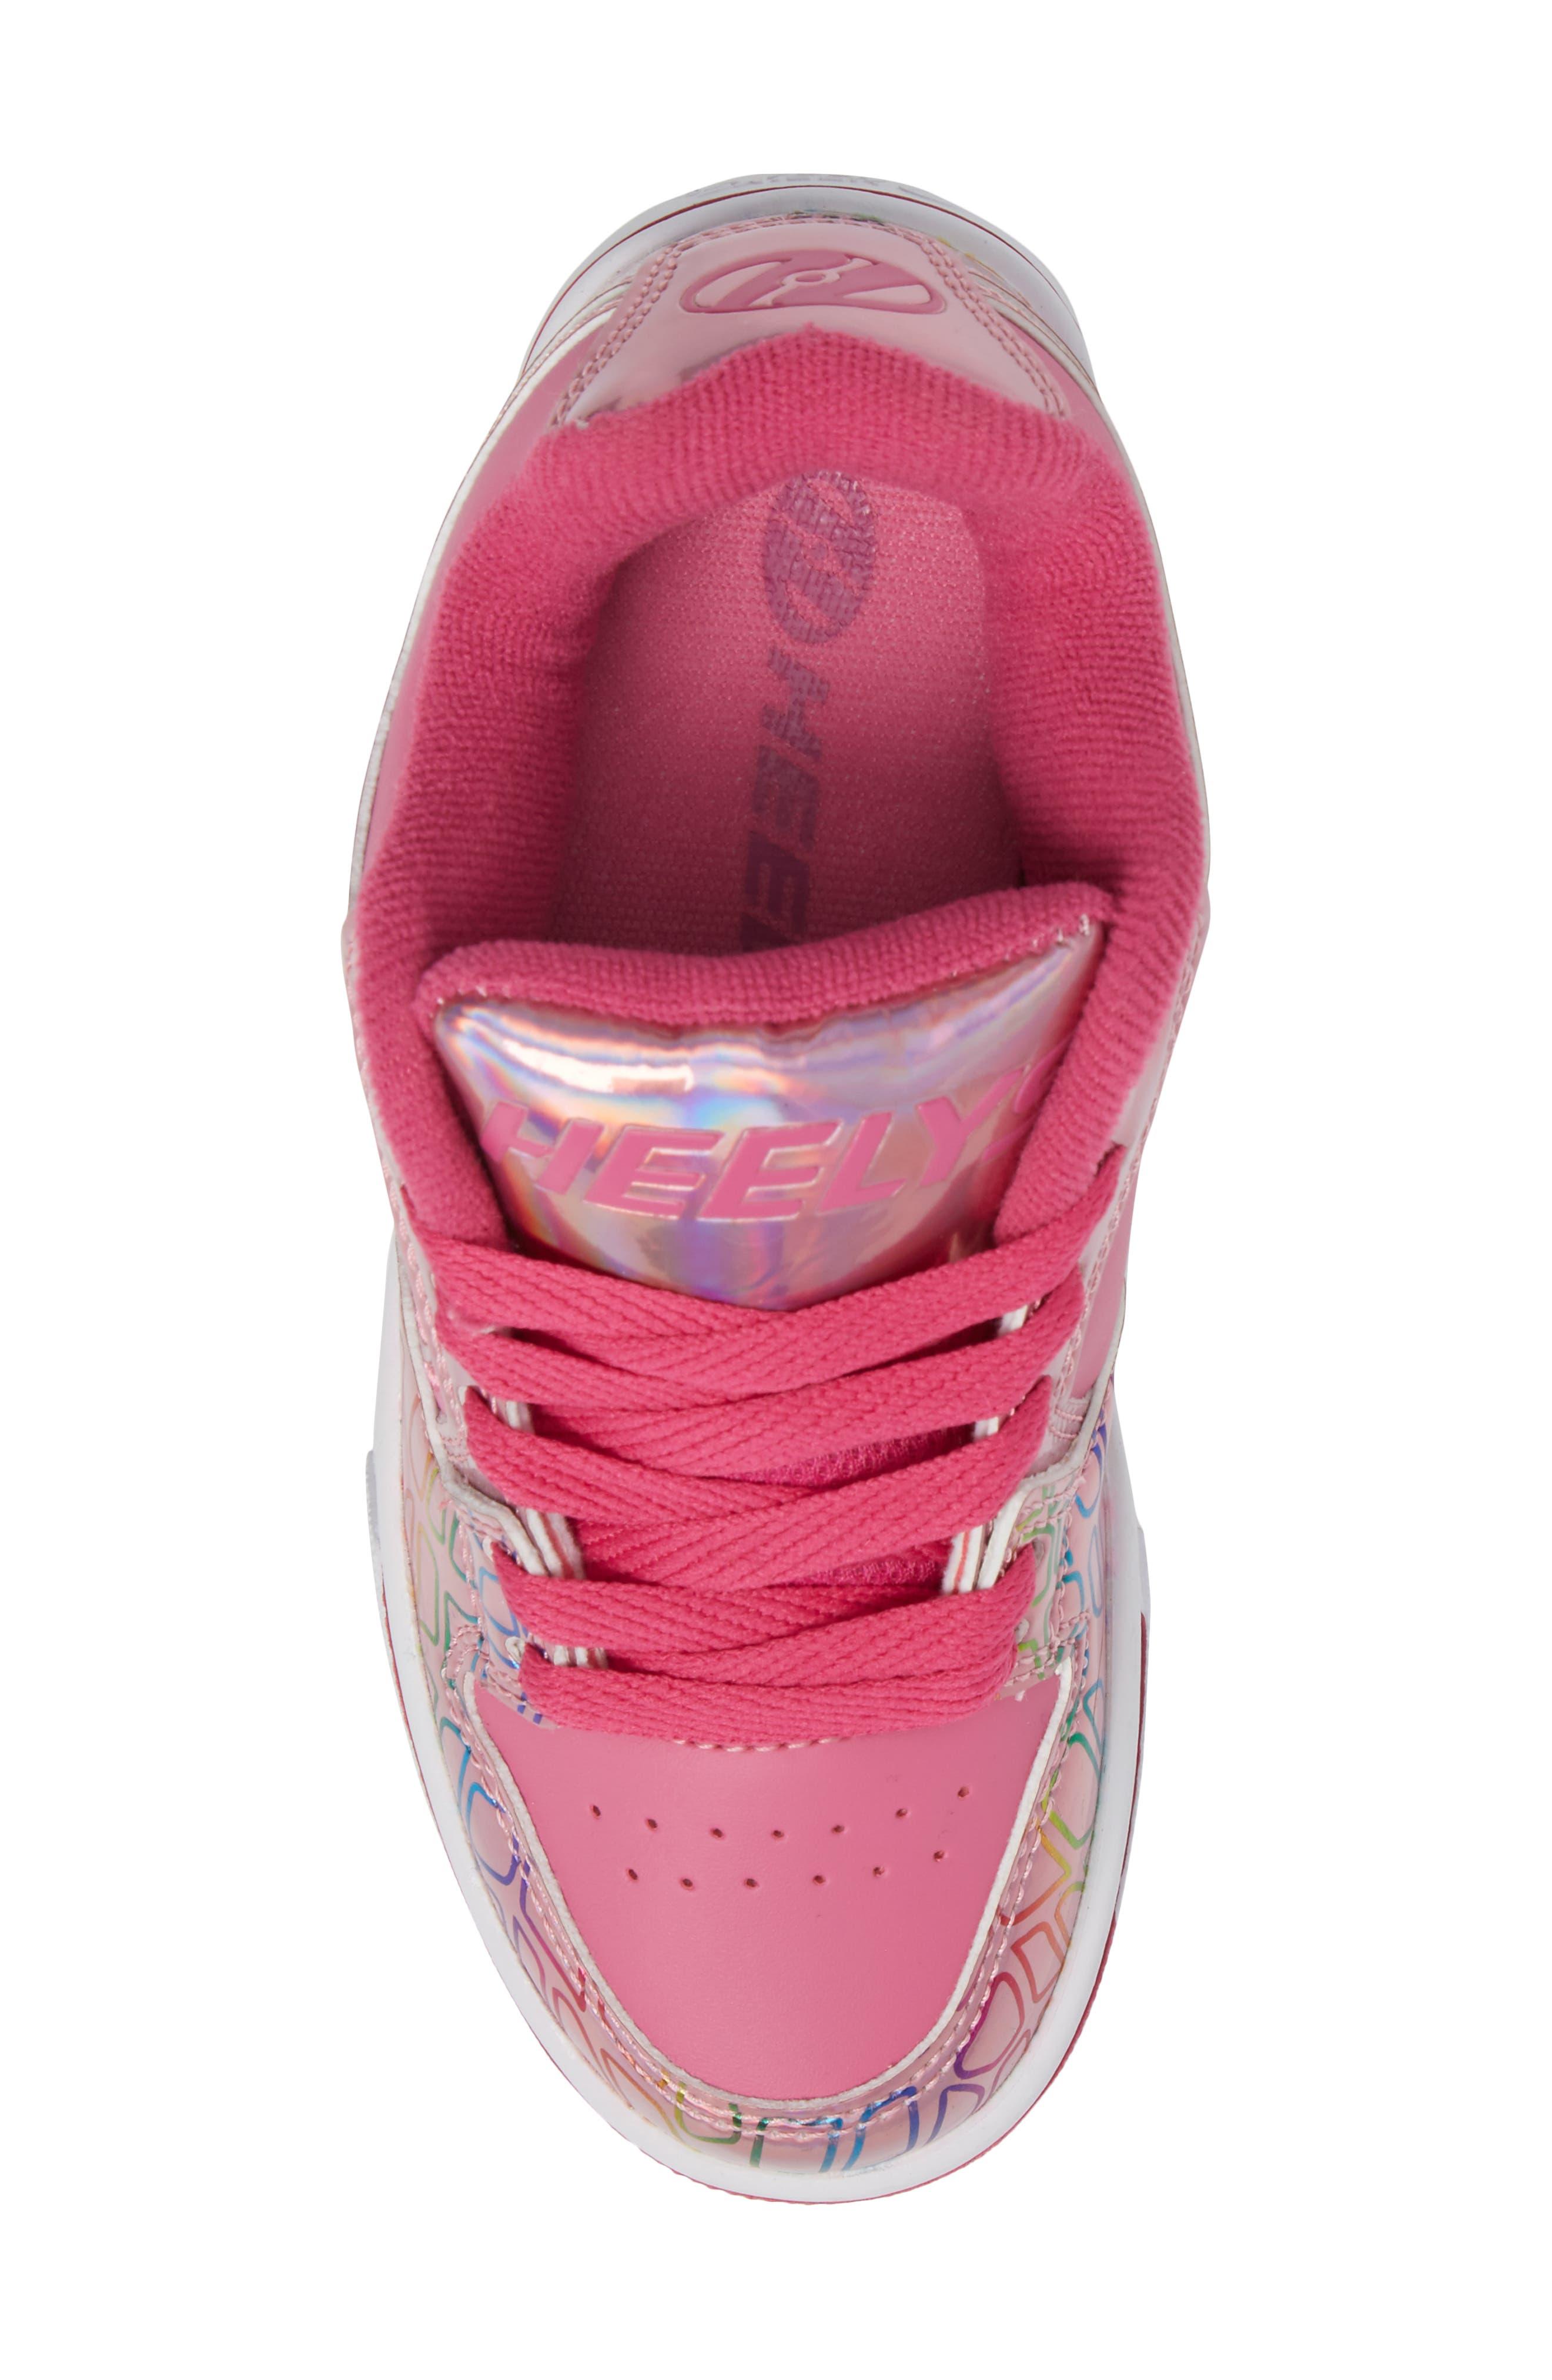 Motion Plus Skate Sneaker,                             Alternate thumbnail 5, color,                             PINK/ LIGHT PINK